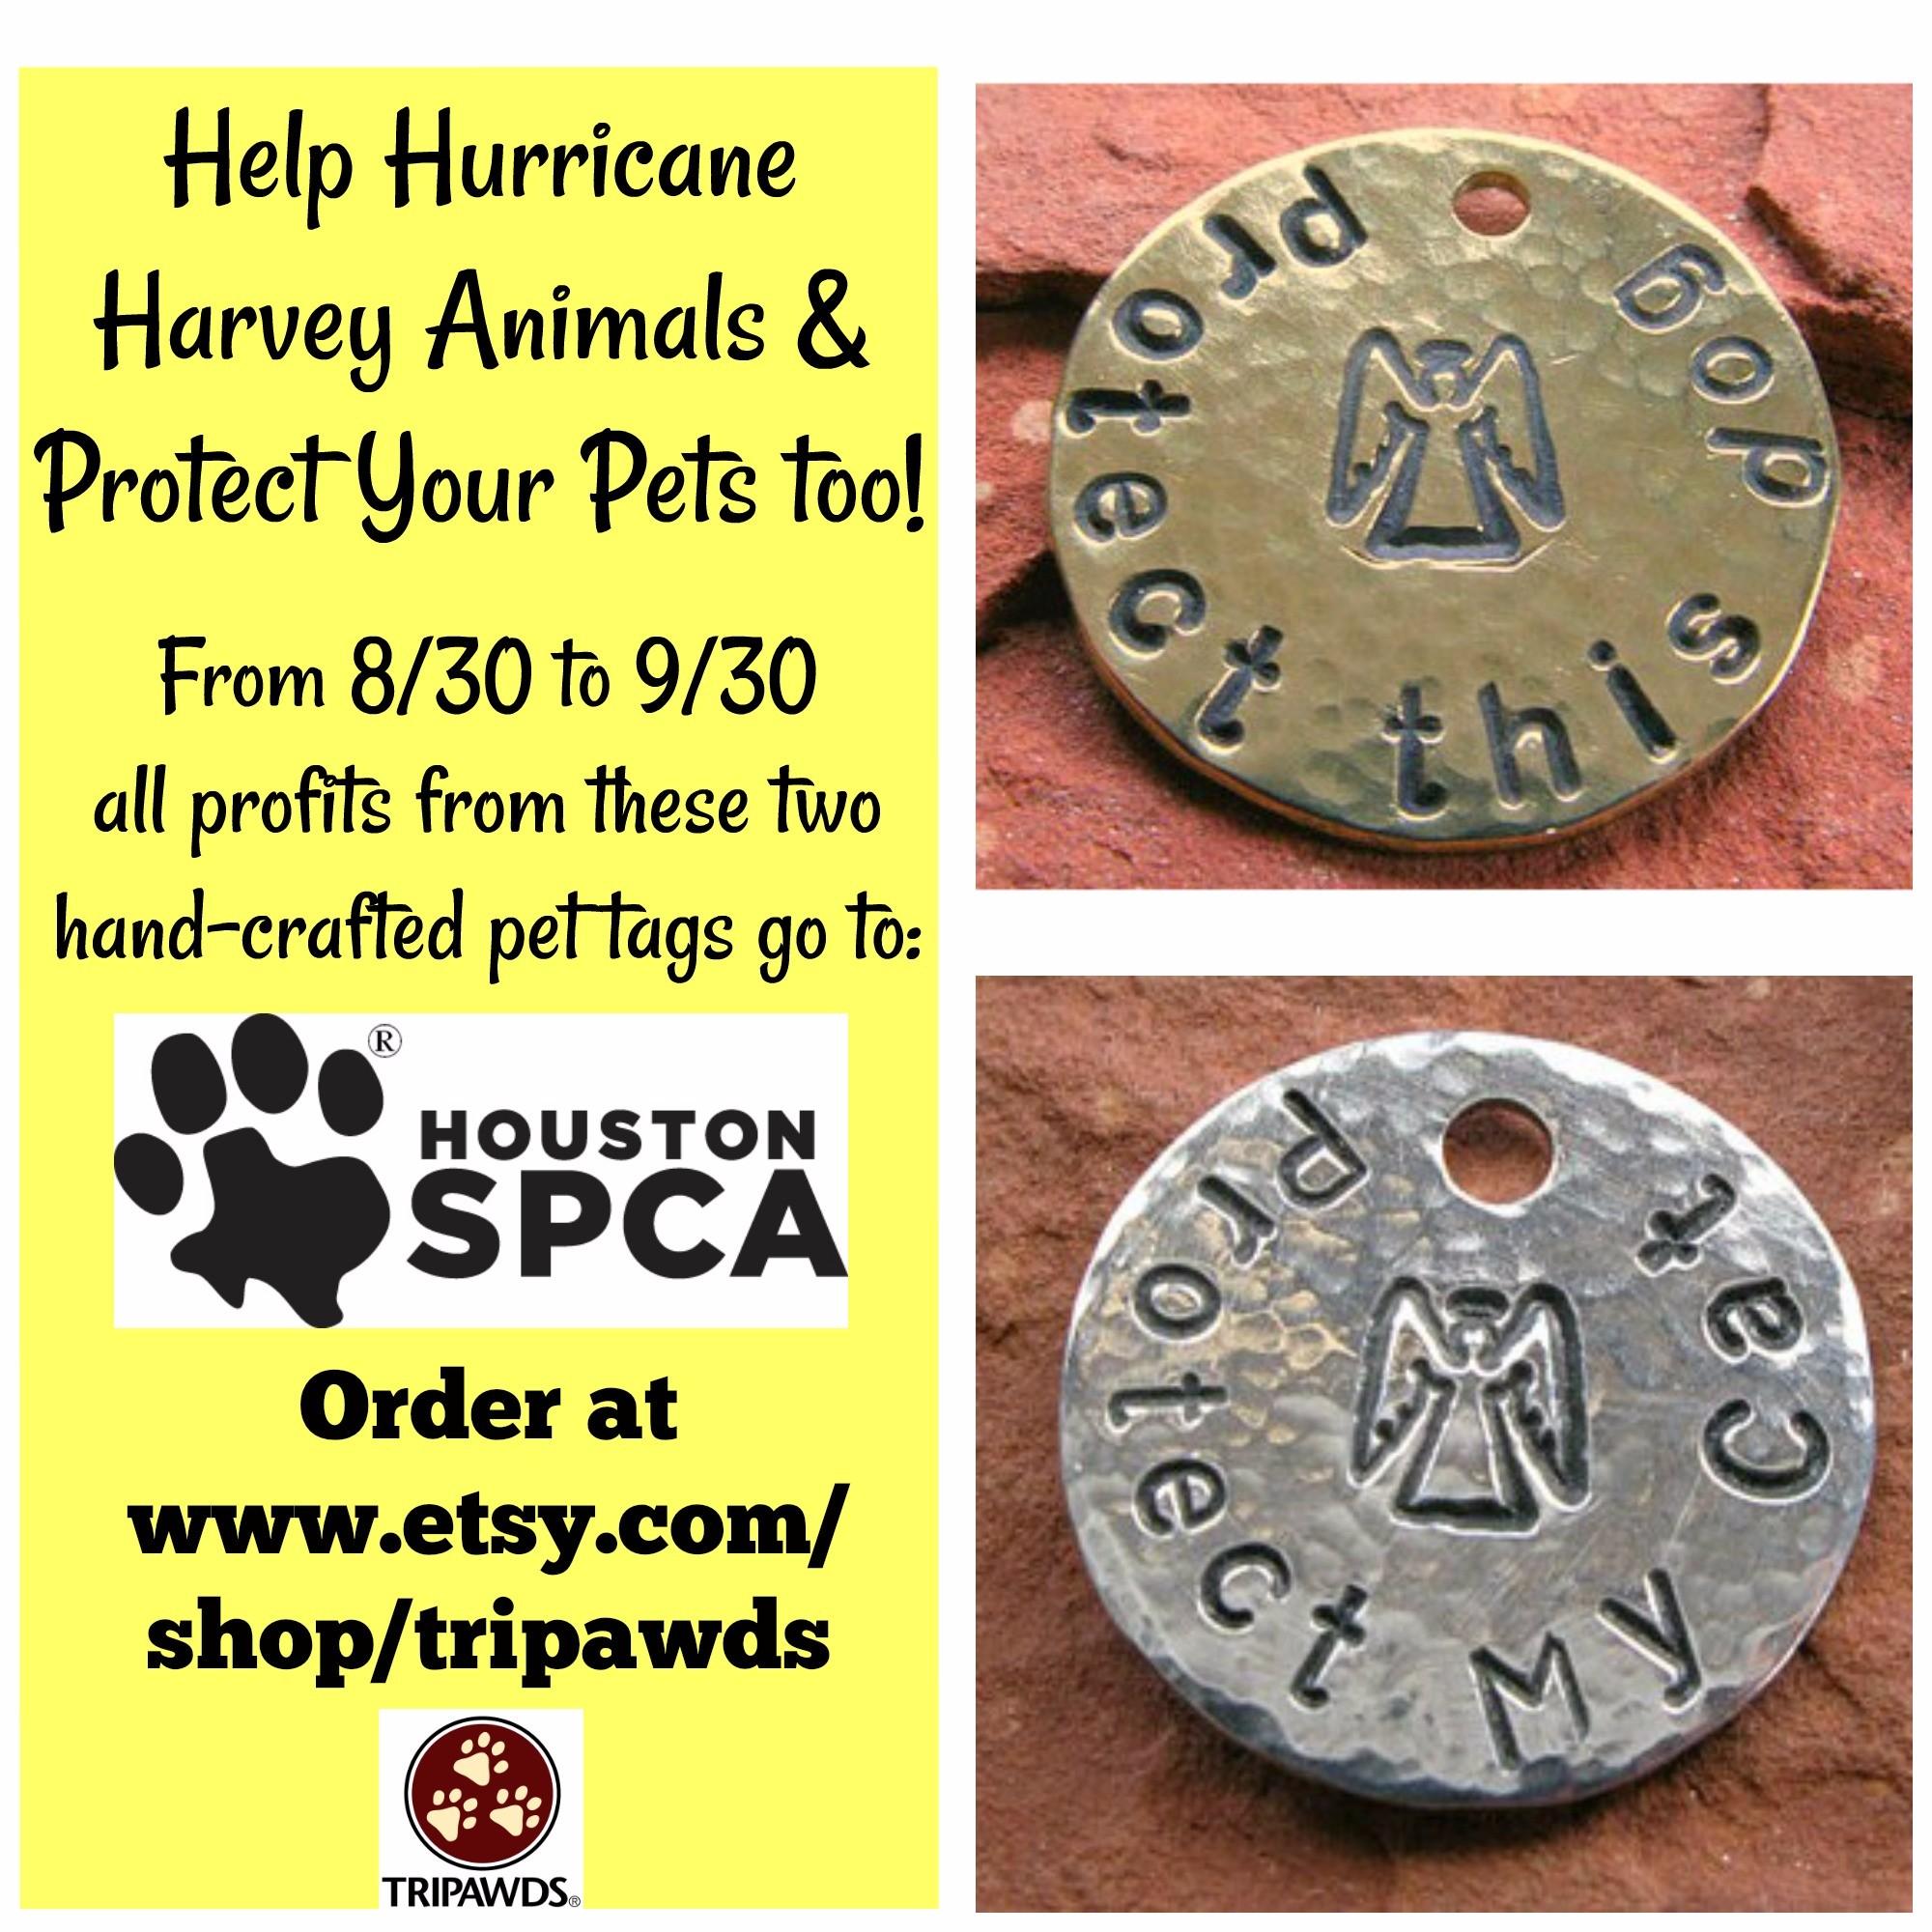 Help #HurricaneHarveyPets with Custom Pet Tags